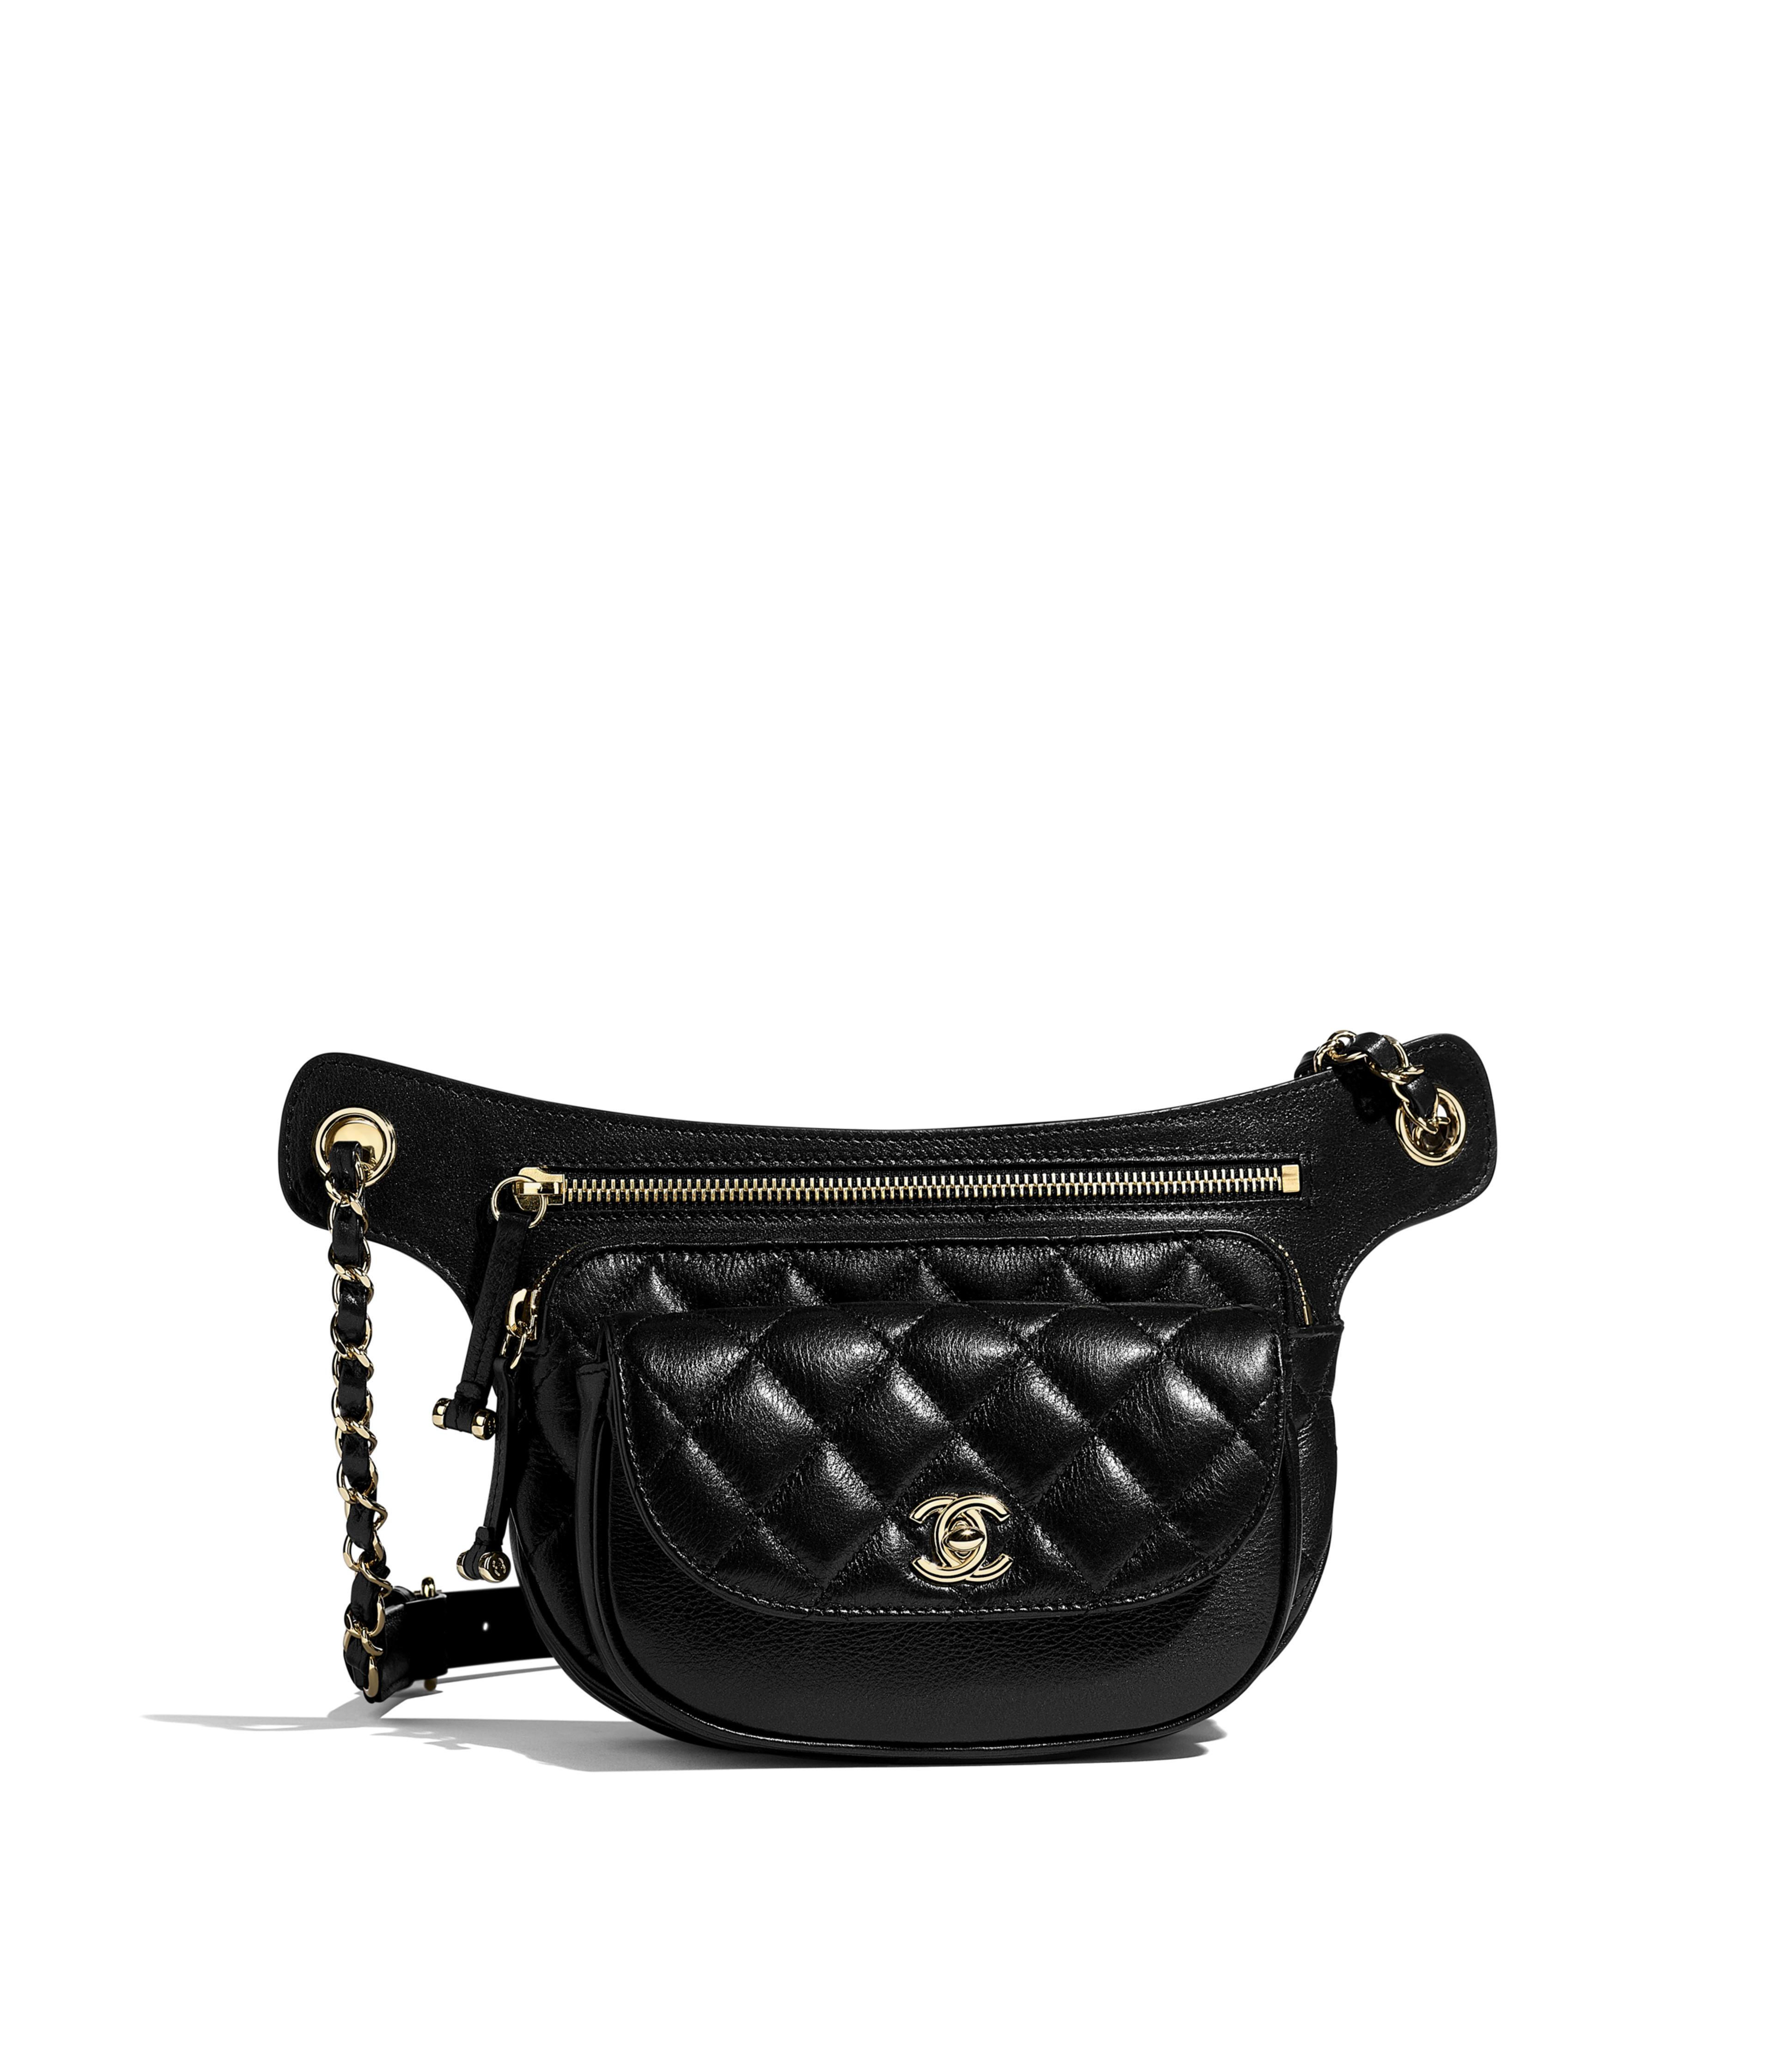 ec35153f3cb Waist Bag Metallic Aged Calfskin & Gold-Tone Metal, Black Ref.  AS0814B0083894305